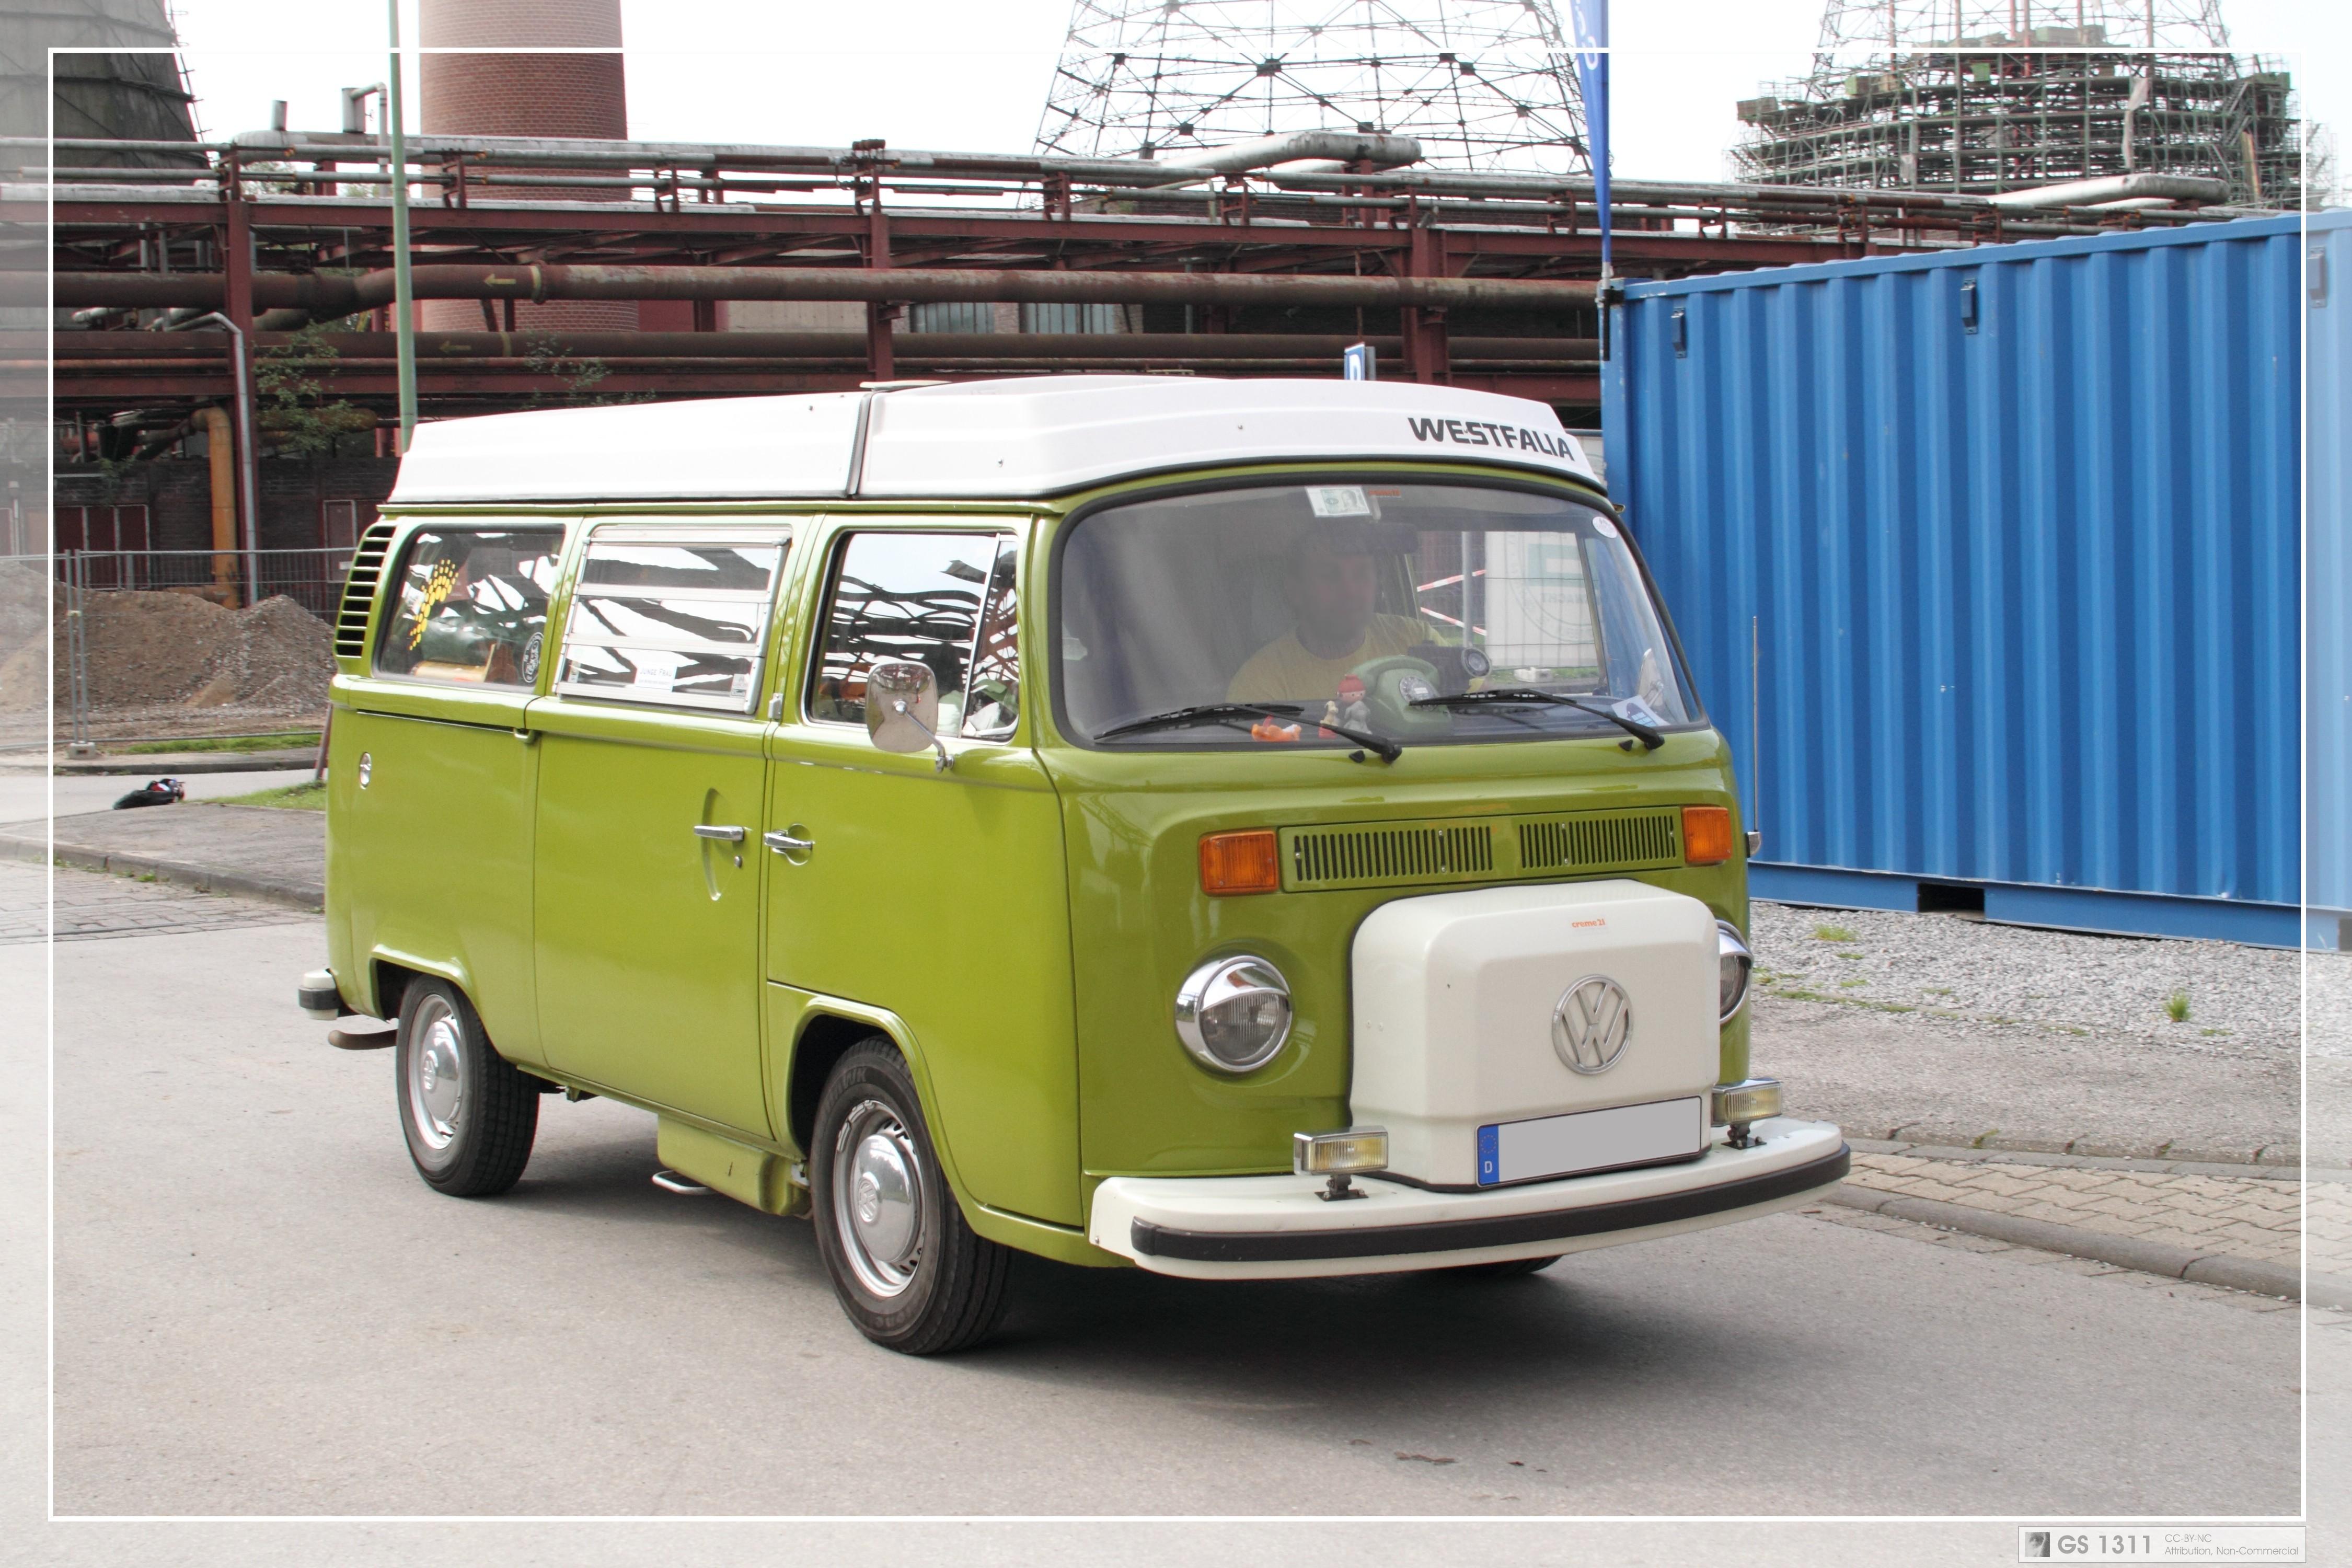 1978 volkswagen t2 bulli campingwagen 03 the. Black Bedroom Furniture Sets. Home Design Ideas